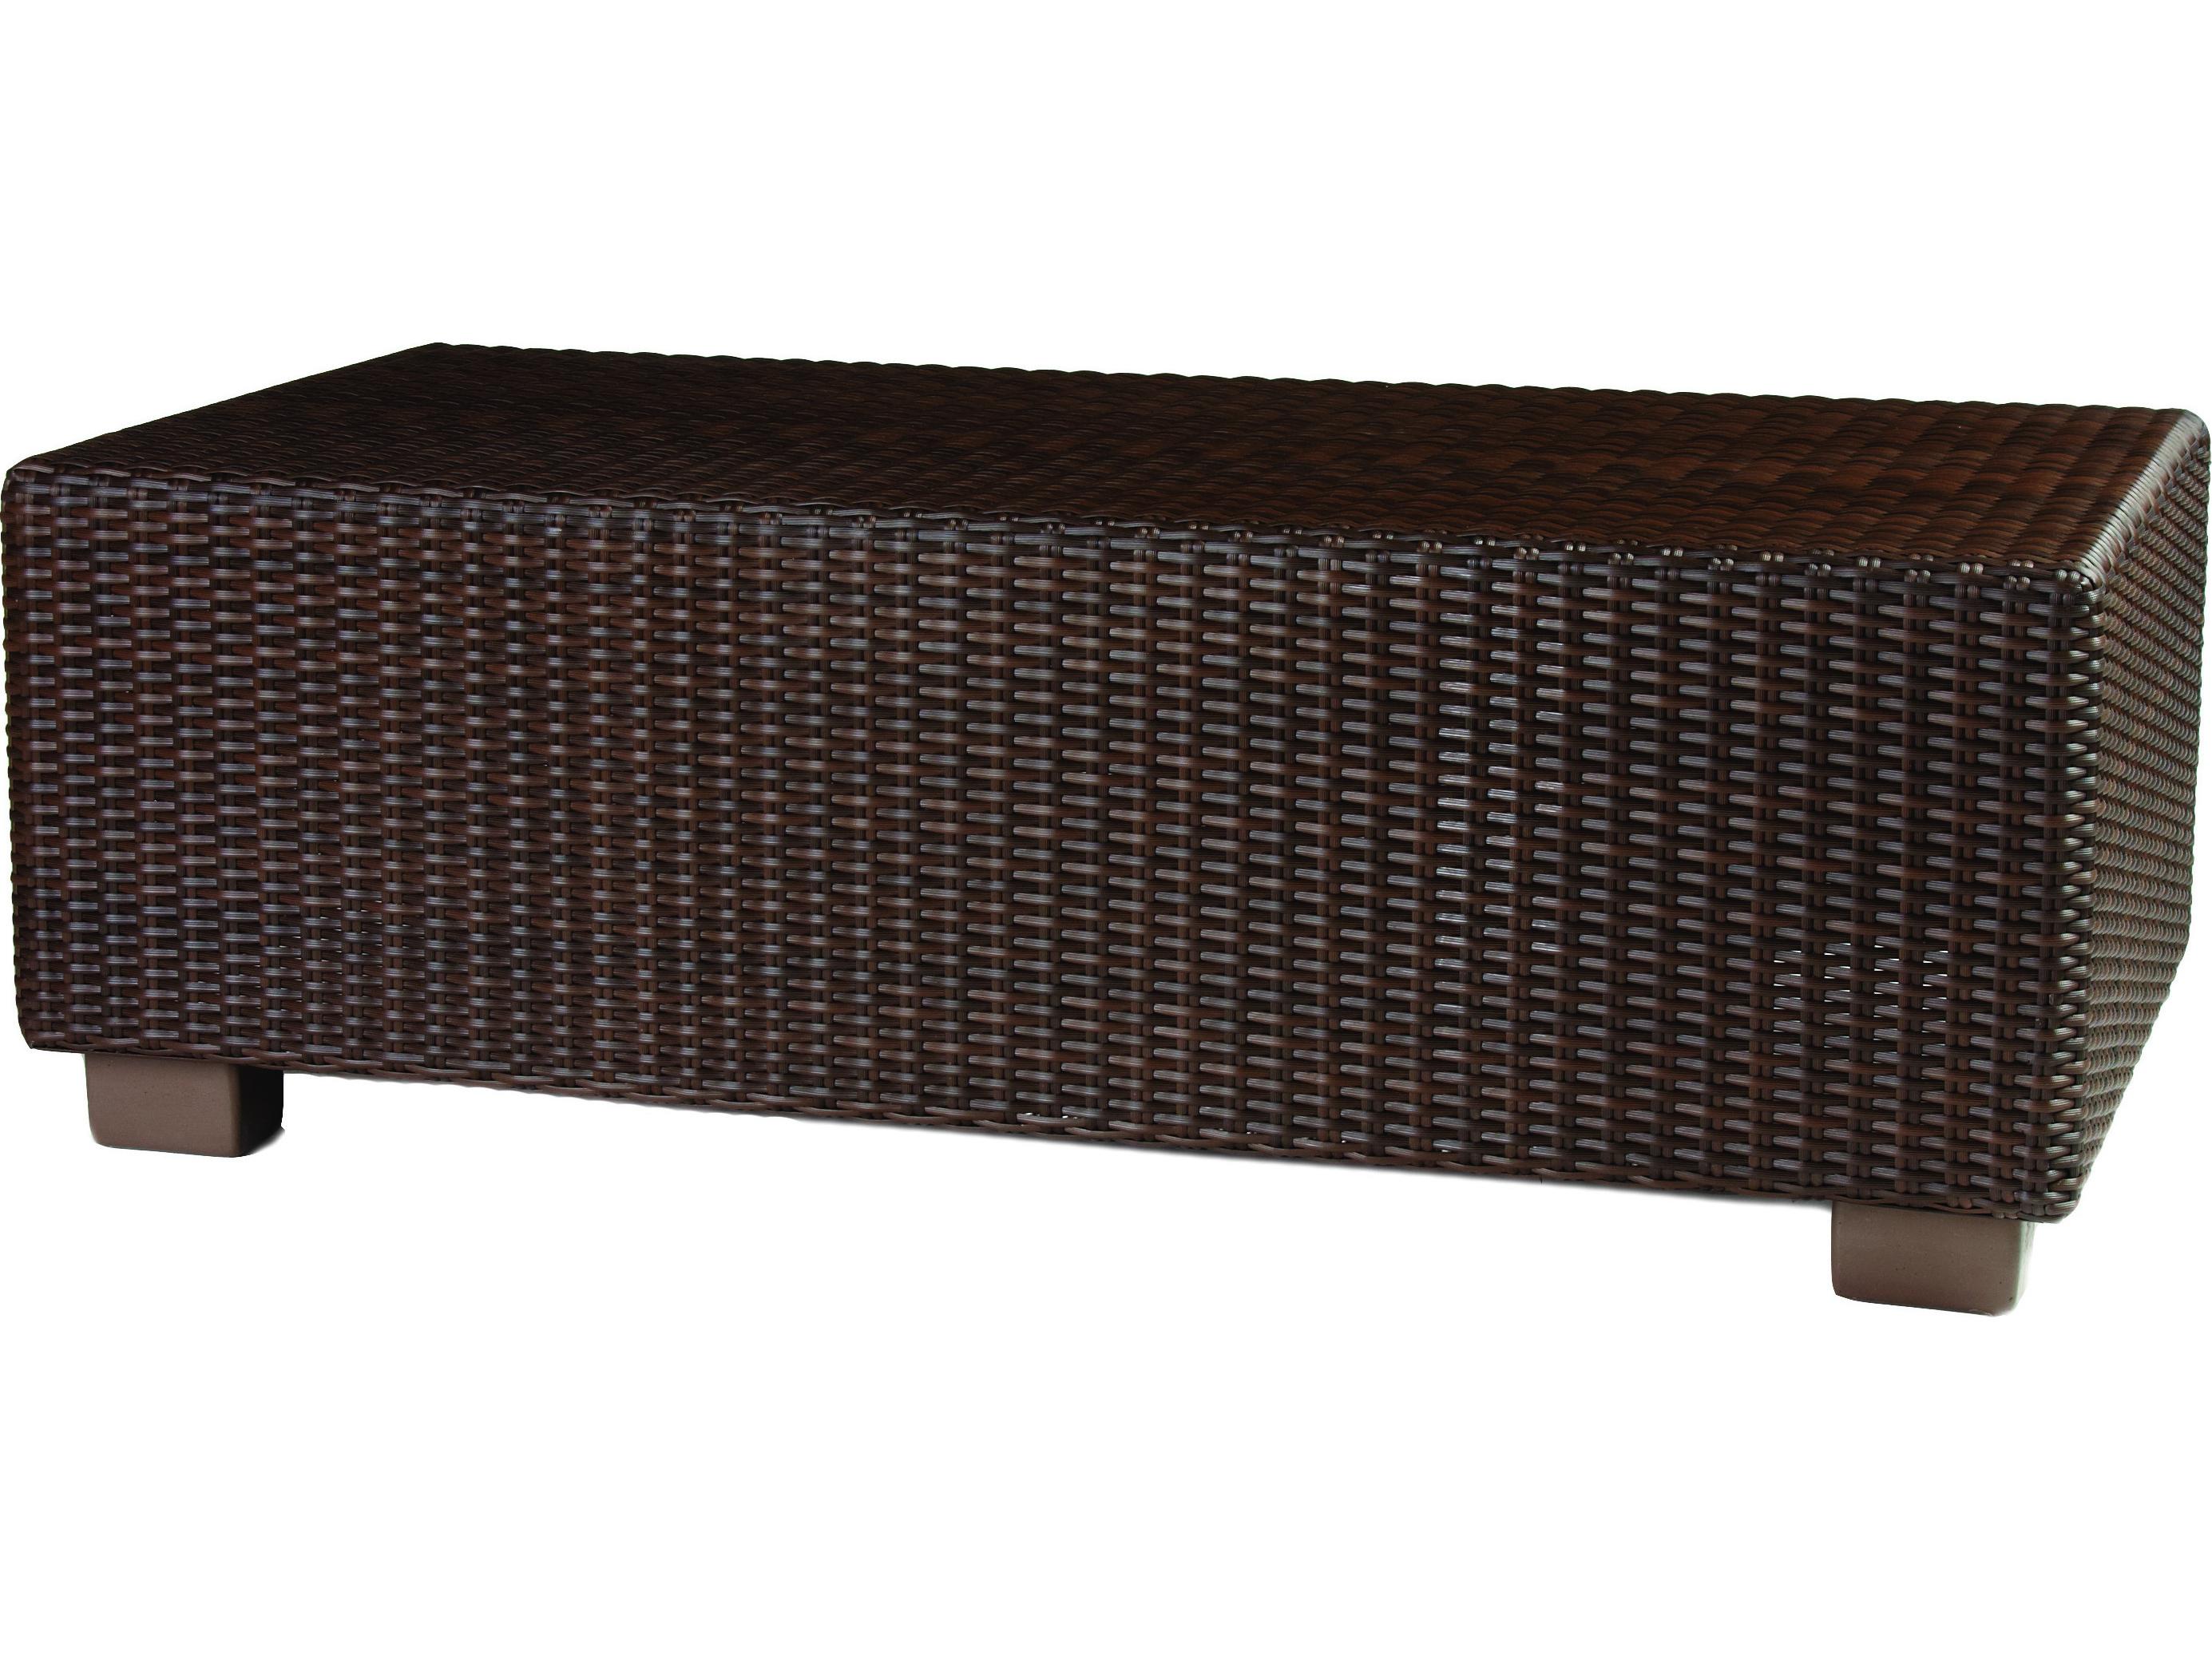 Whitecraft Montecito Wicker 42 X 24 Rectangular Coffee Table S511213